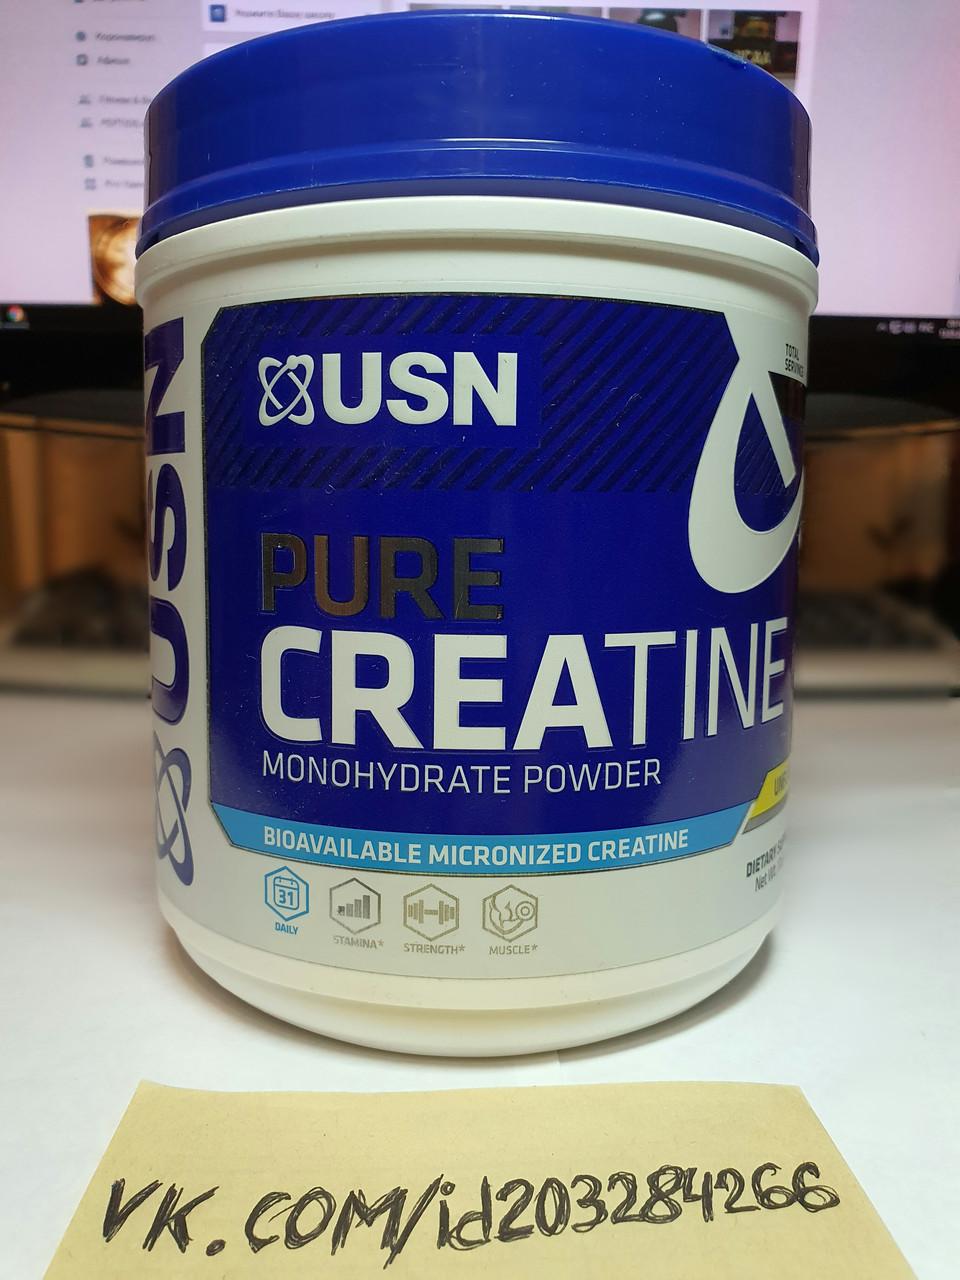 Креатин моногидрат, USN Pure Creatine Monohydrate Powder 500г